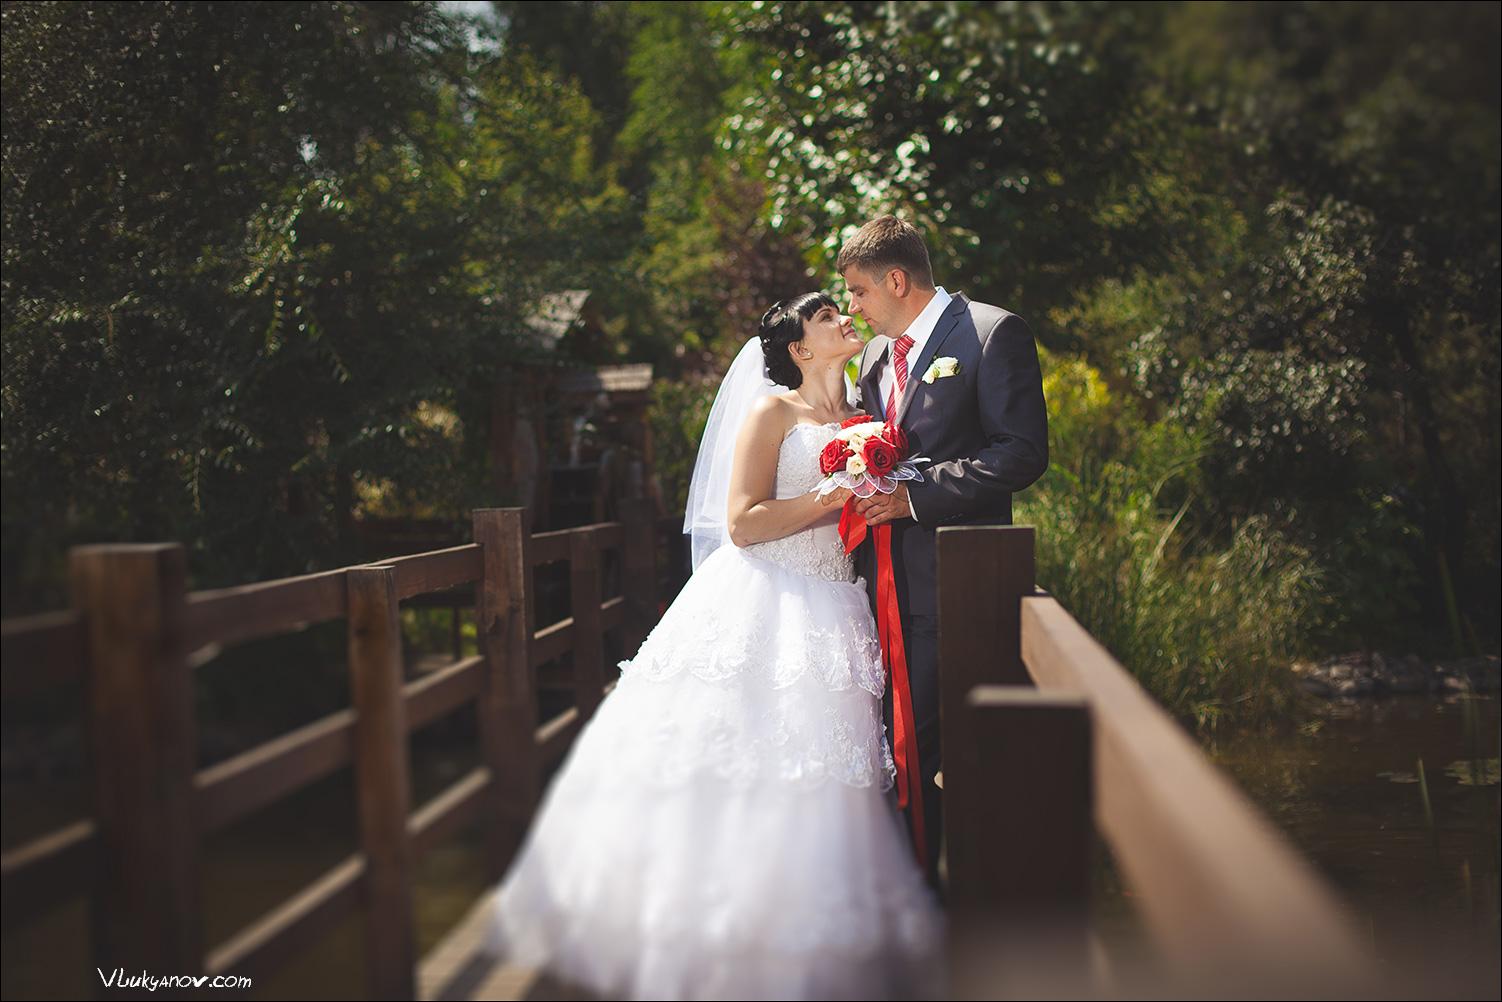 Фотограф, Владимир Лукьянов, Свадьба, Абакан